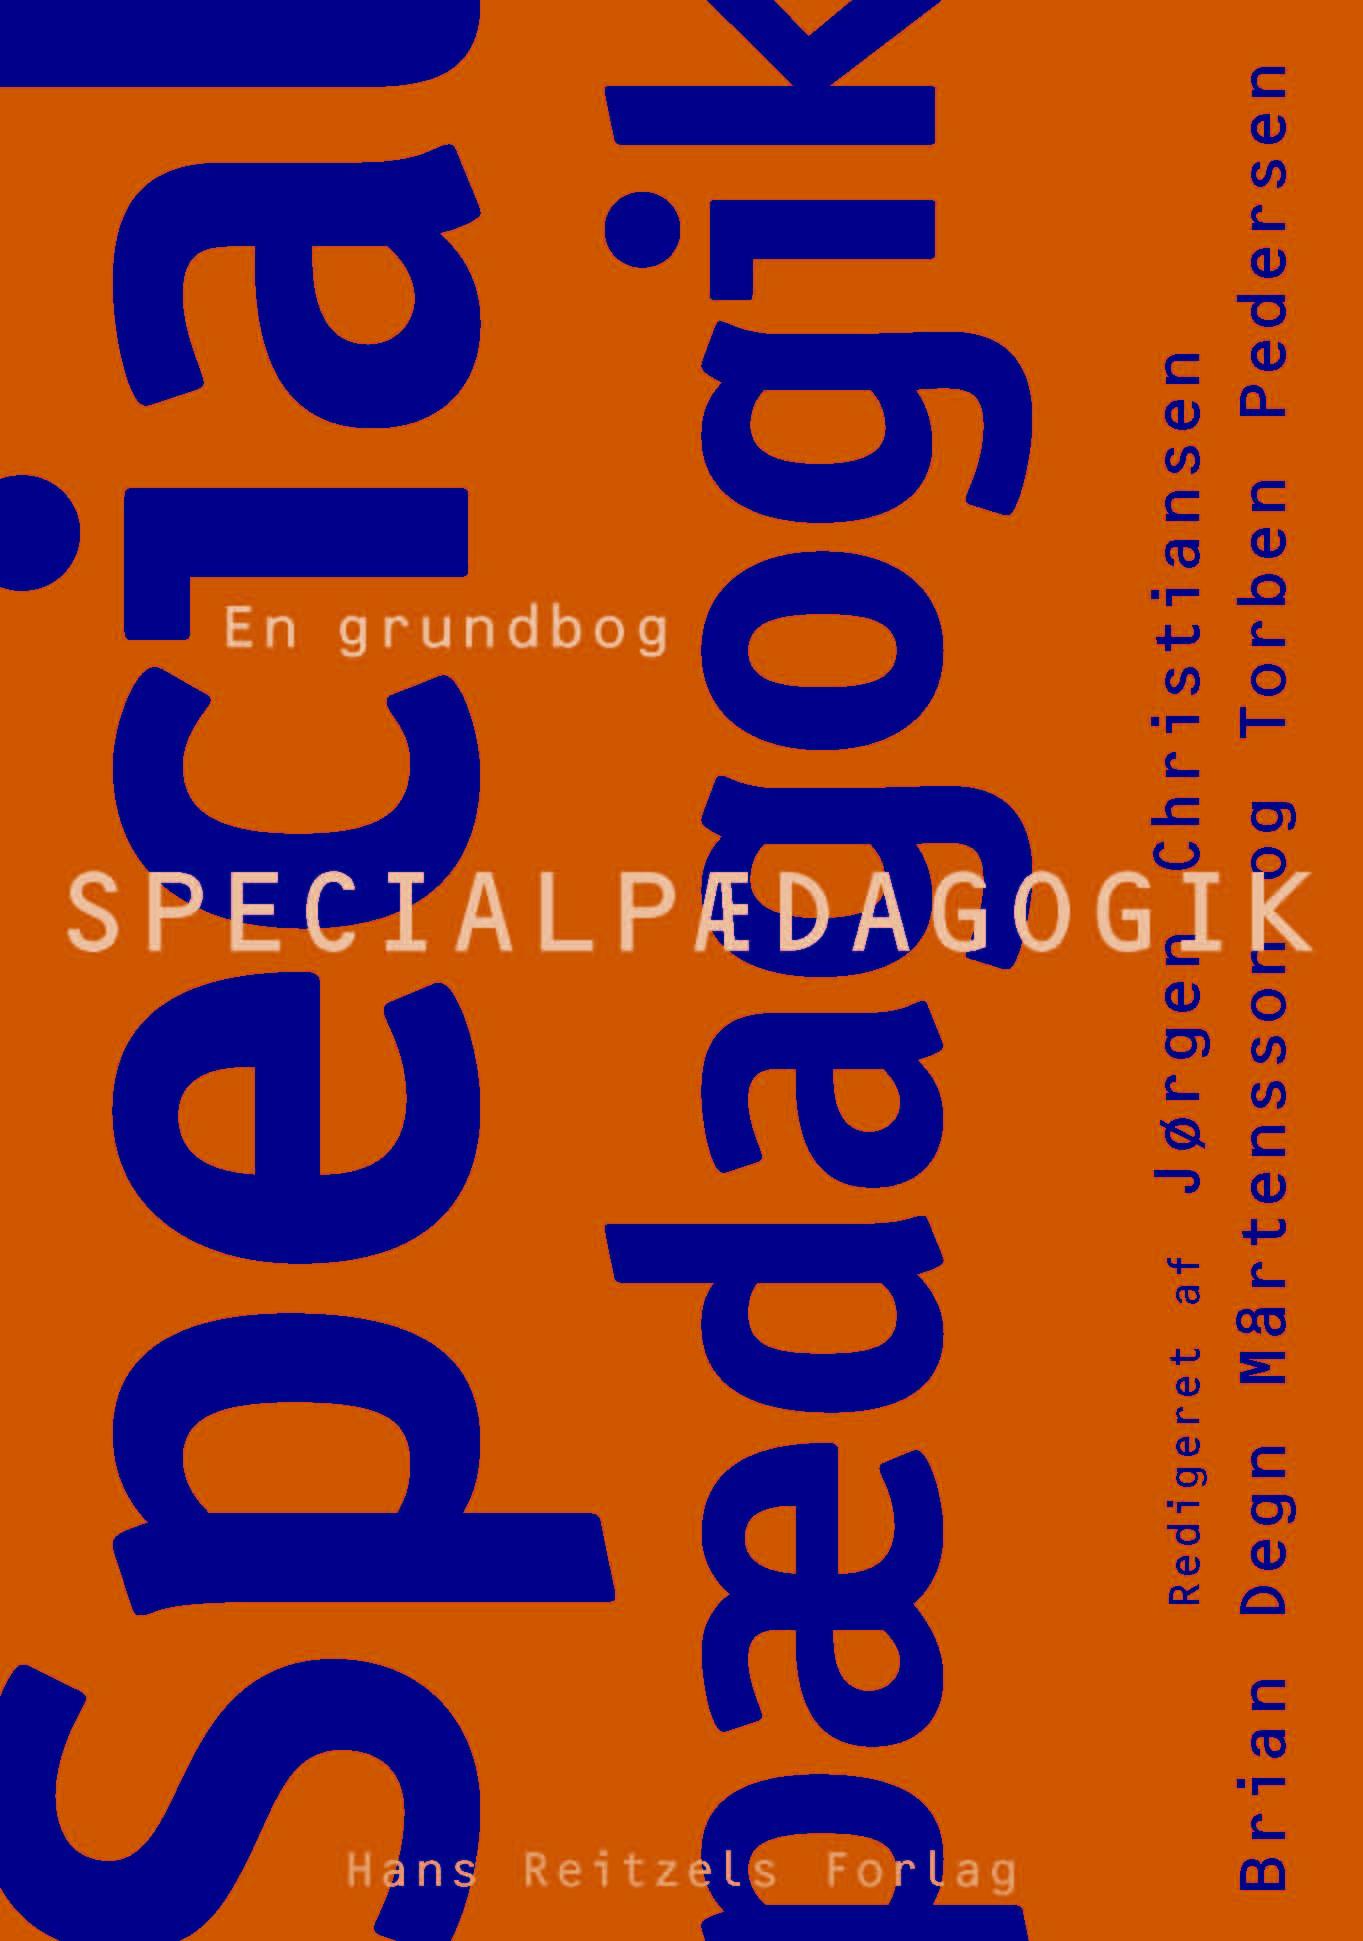 Specialpædagogik - en grundbog